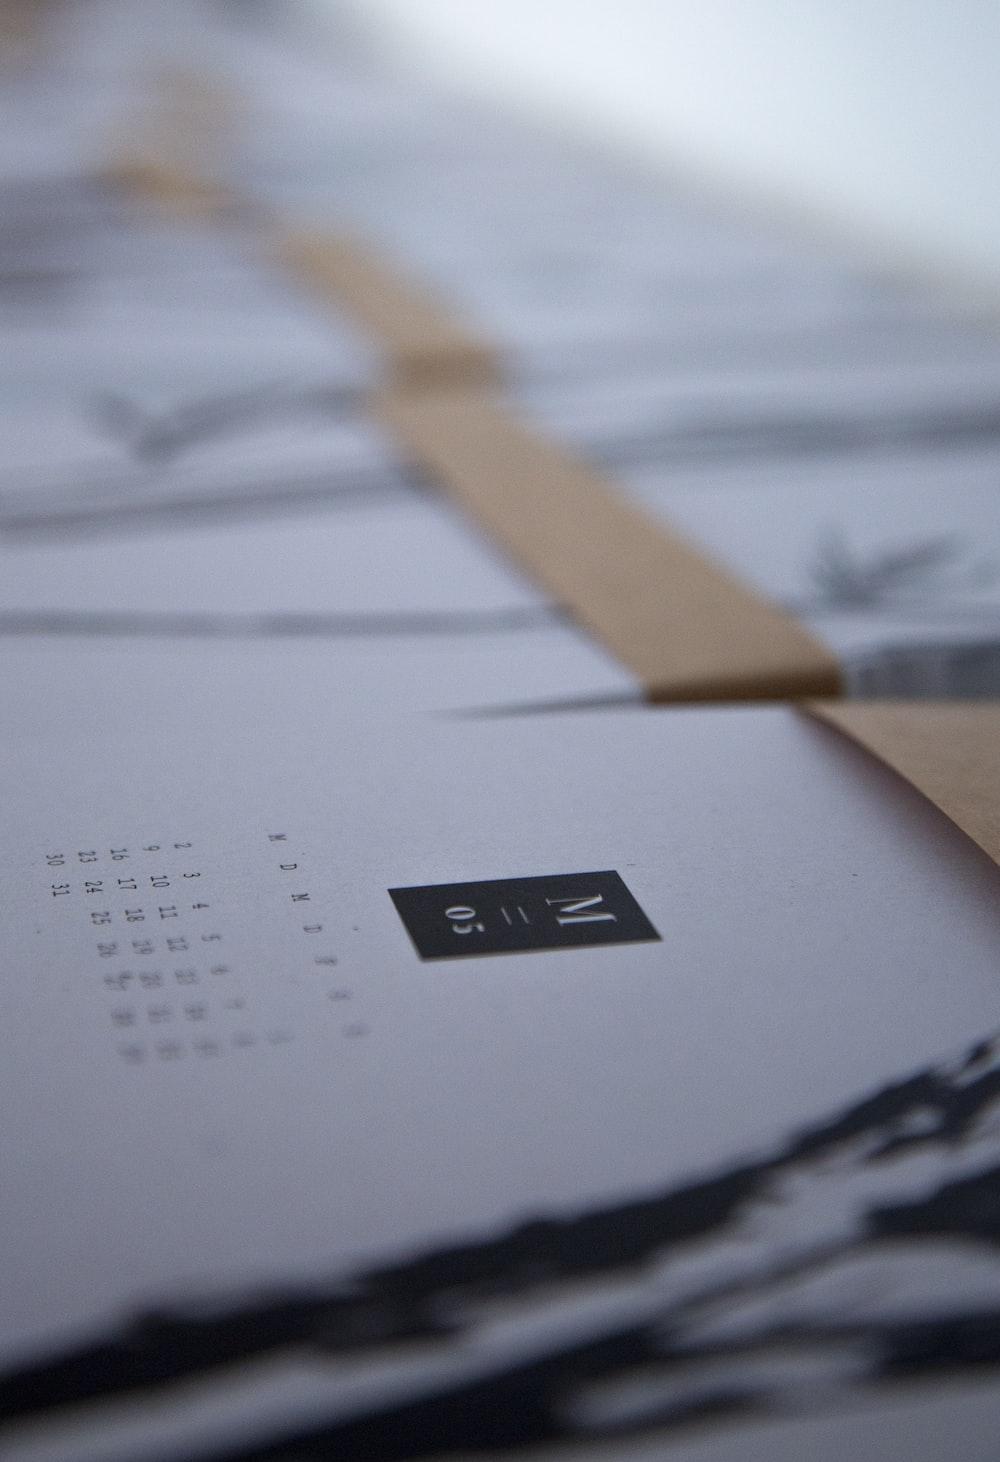 white printer paper with black print